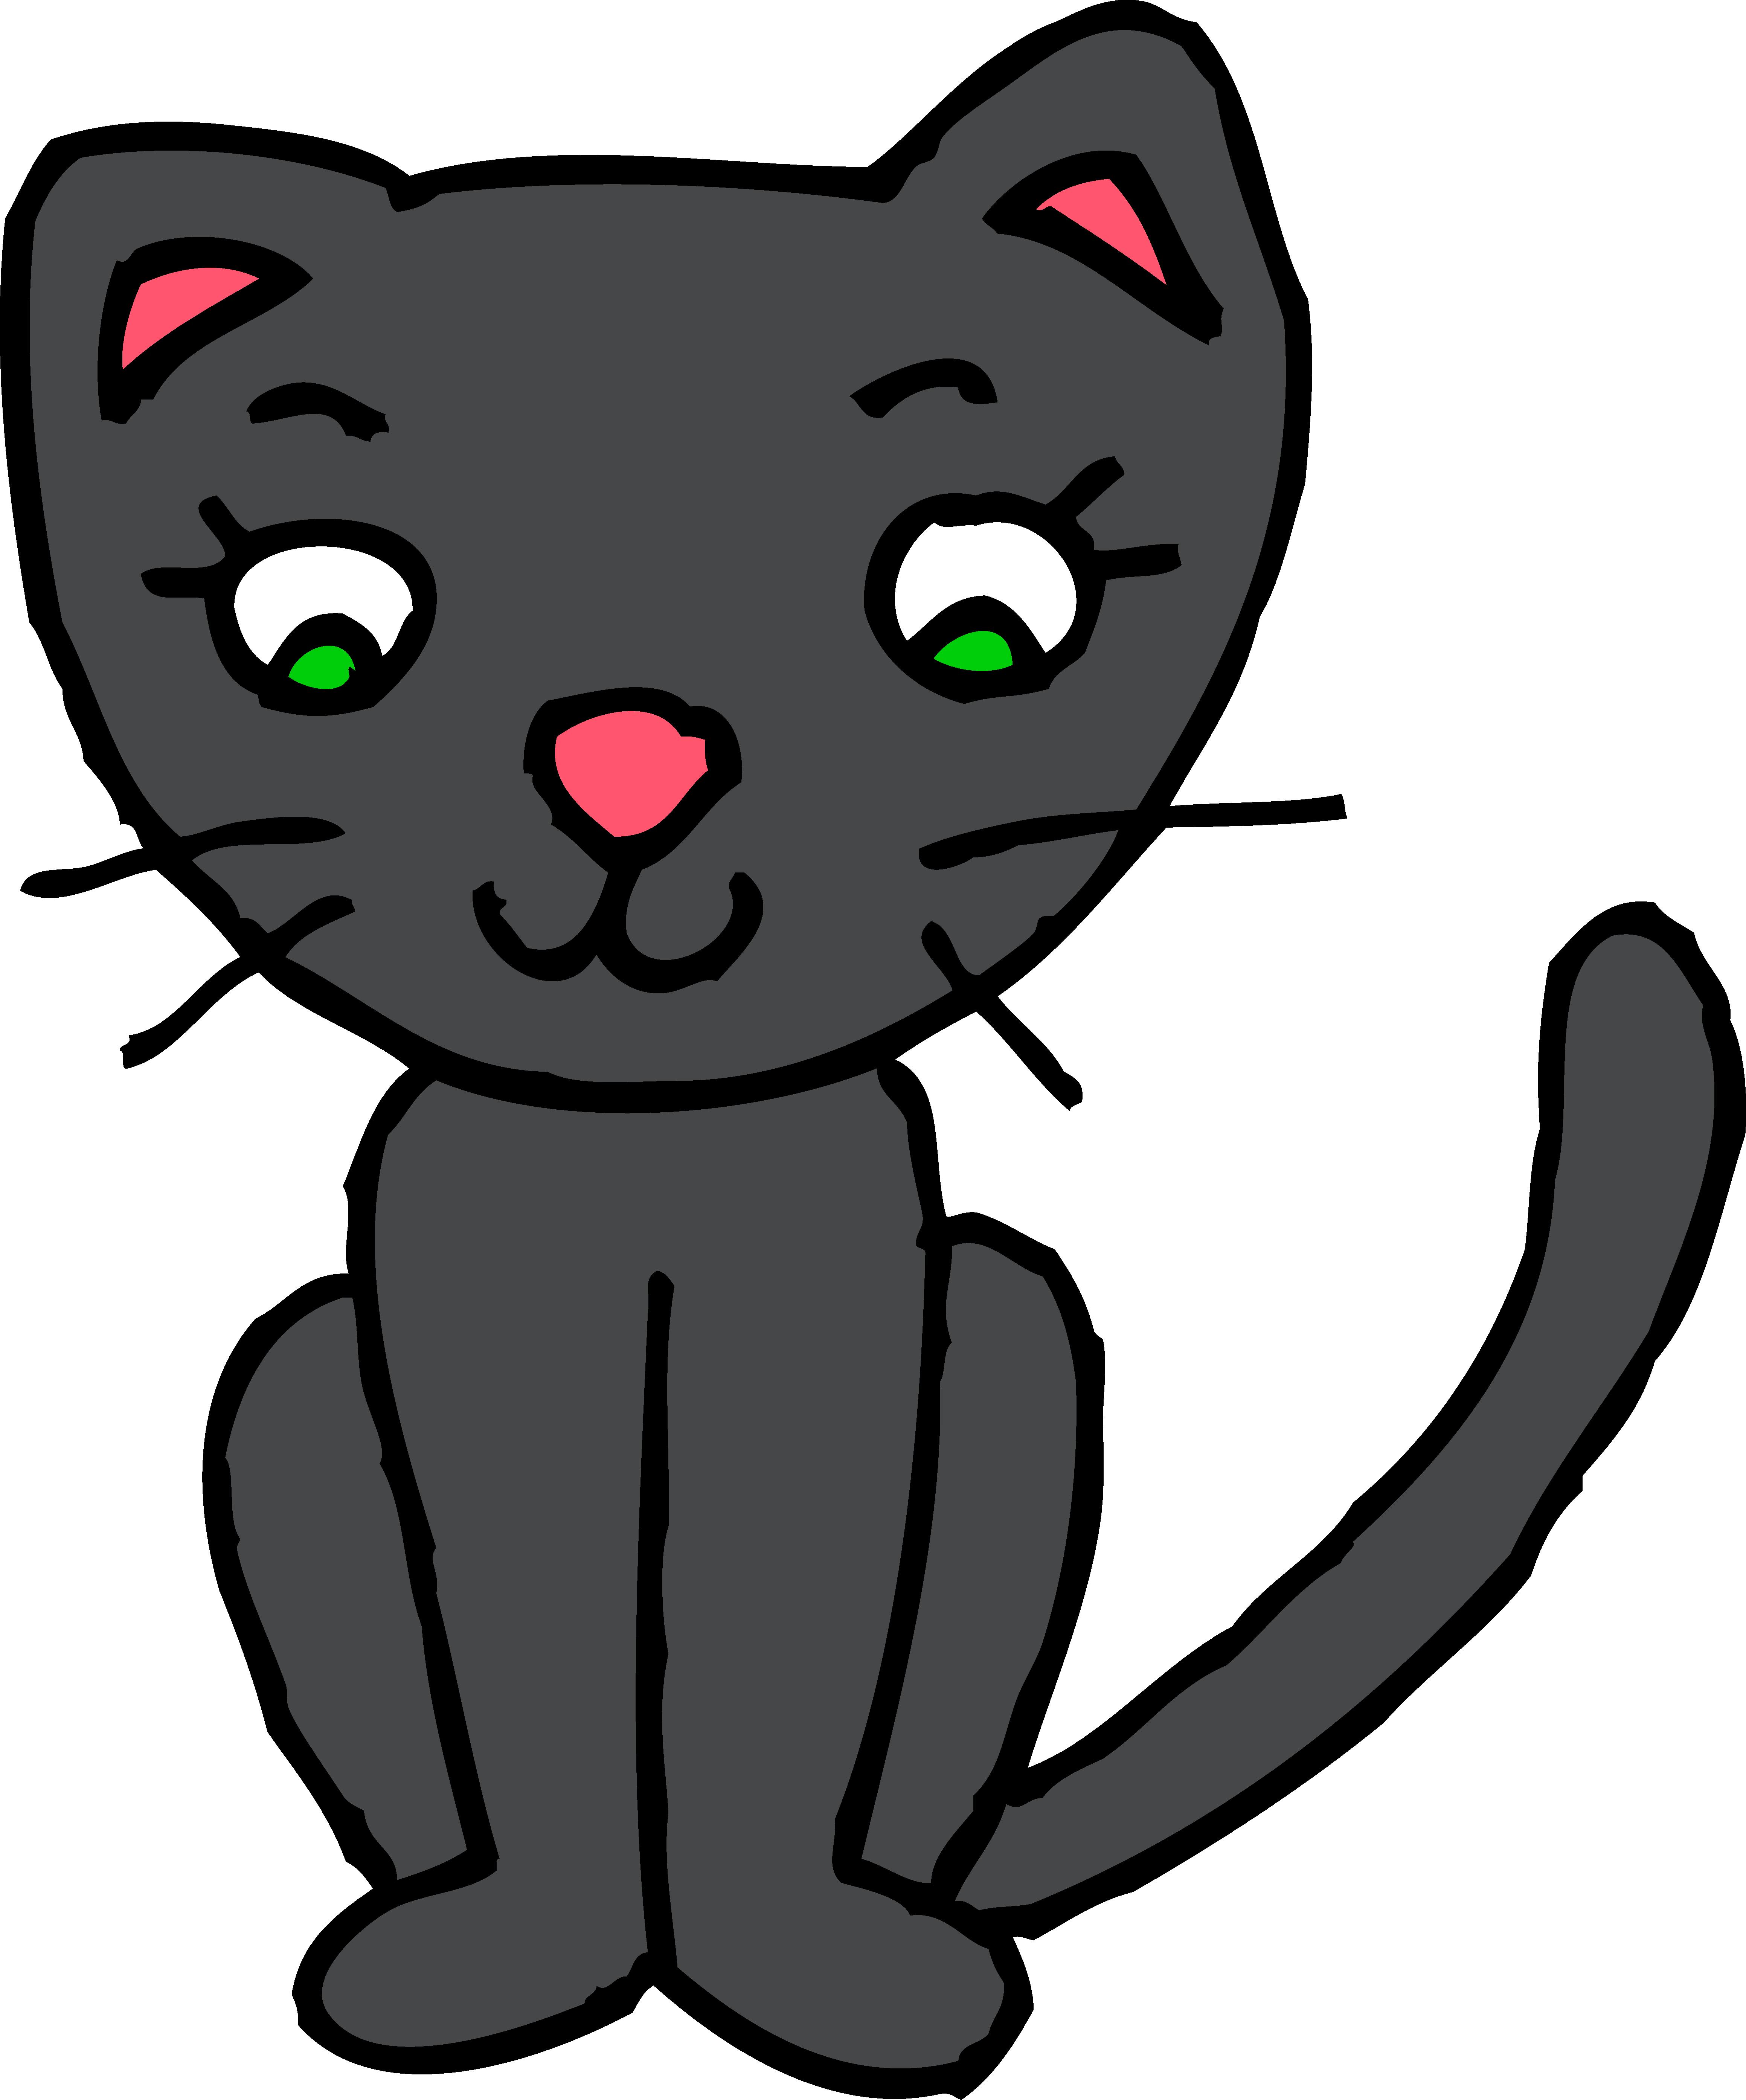 Cat Clipart Image #2461-Cat Clipart Image #2461-4